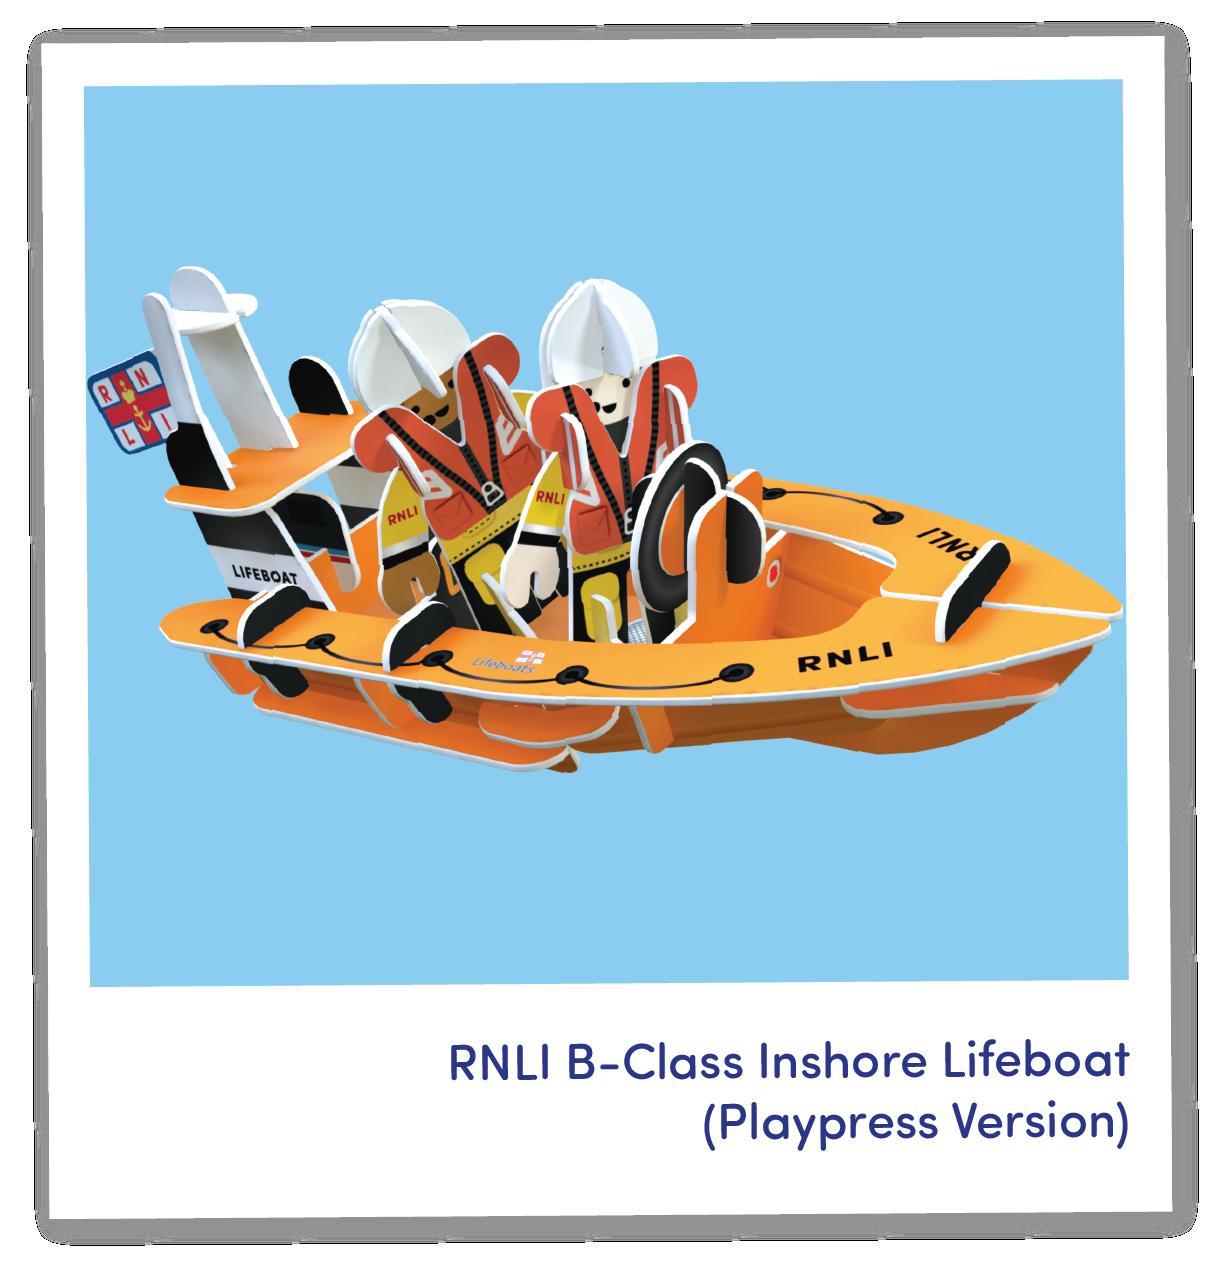 Images_Playpress RNLU inshore lifeboat bespoke build photo.png